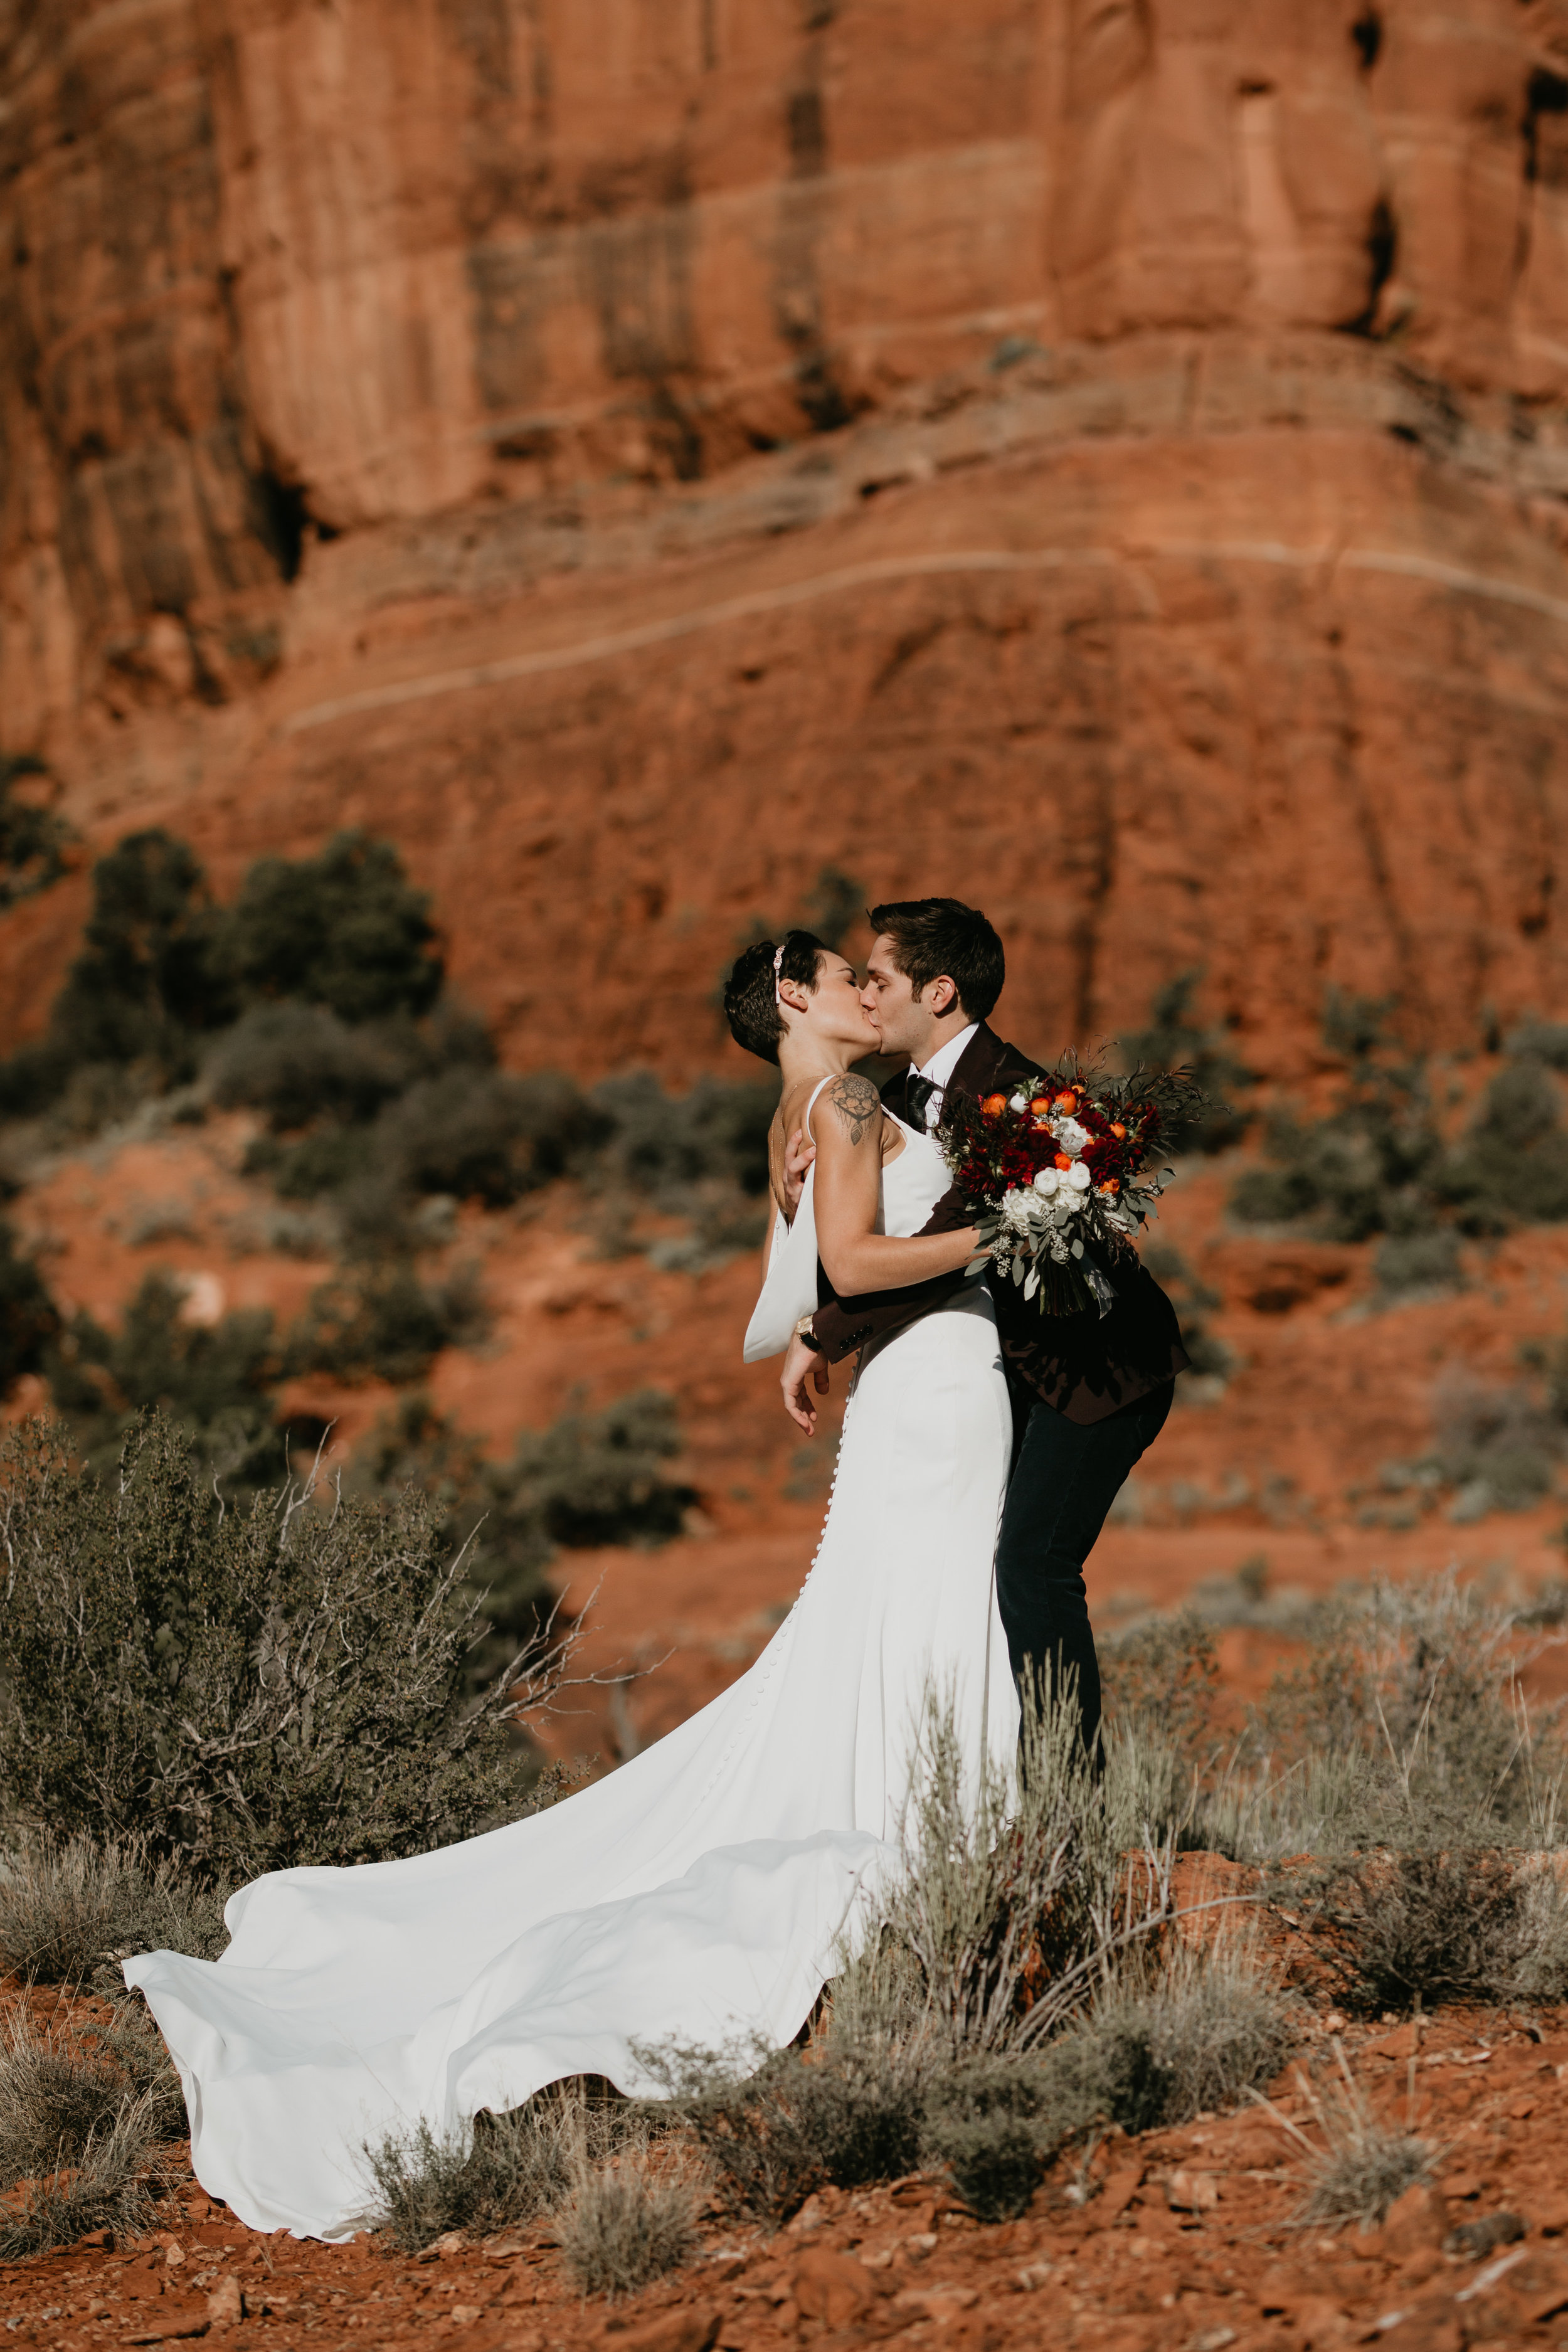 nicole-daacke-photography-sedona-arizona-destination-elopement-wedding-photographer-catherdral-rock-hiking-elopement-sedona-river-elopement-photos-desert-rock-wedding-photographer-laid-back-spontaneous-elopement-70.jpg